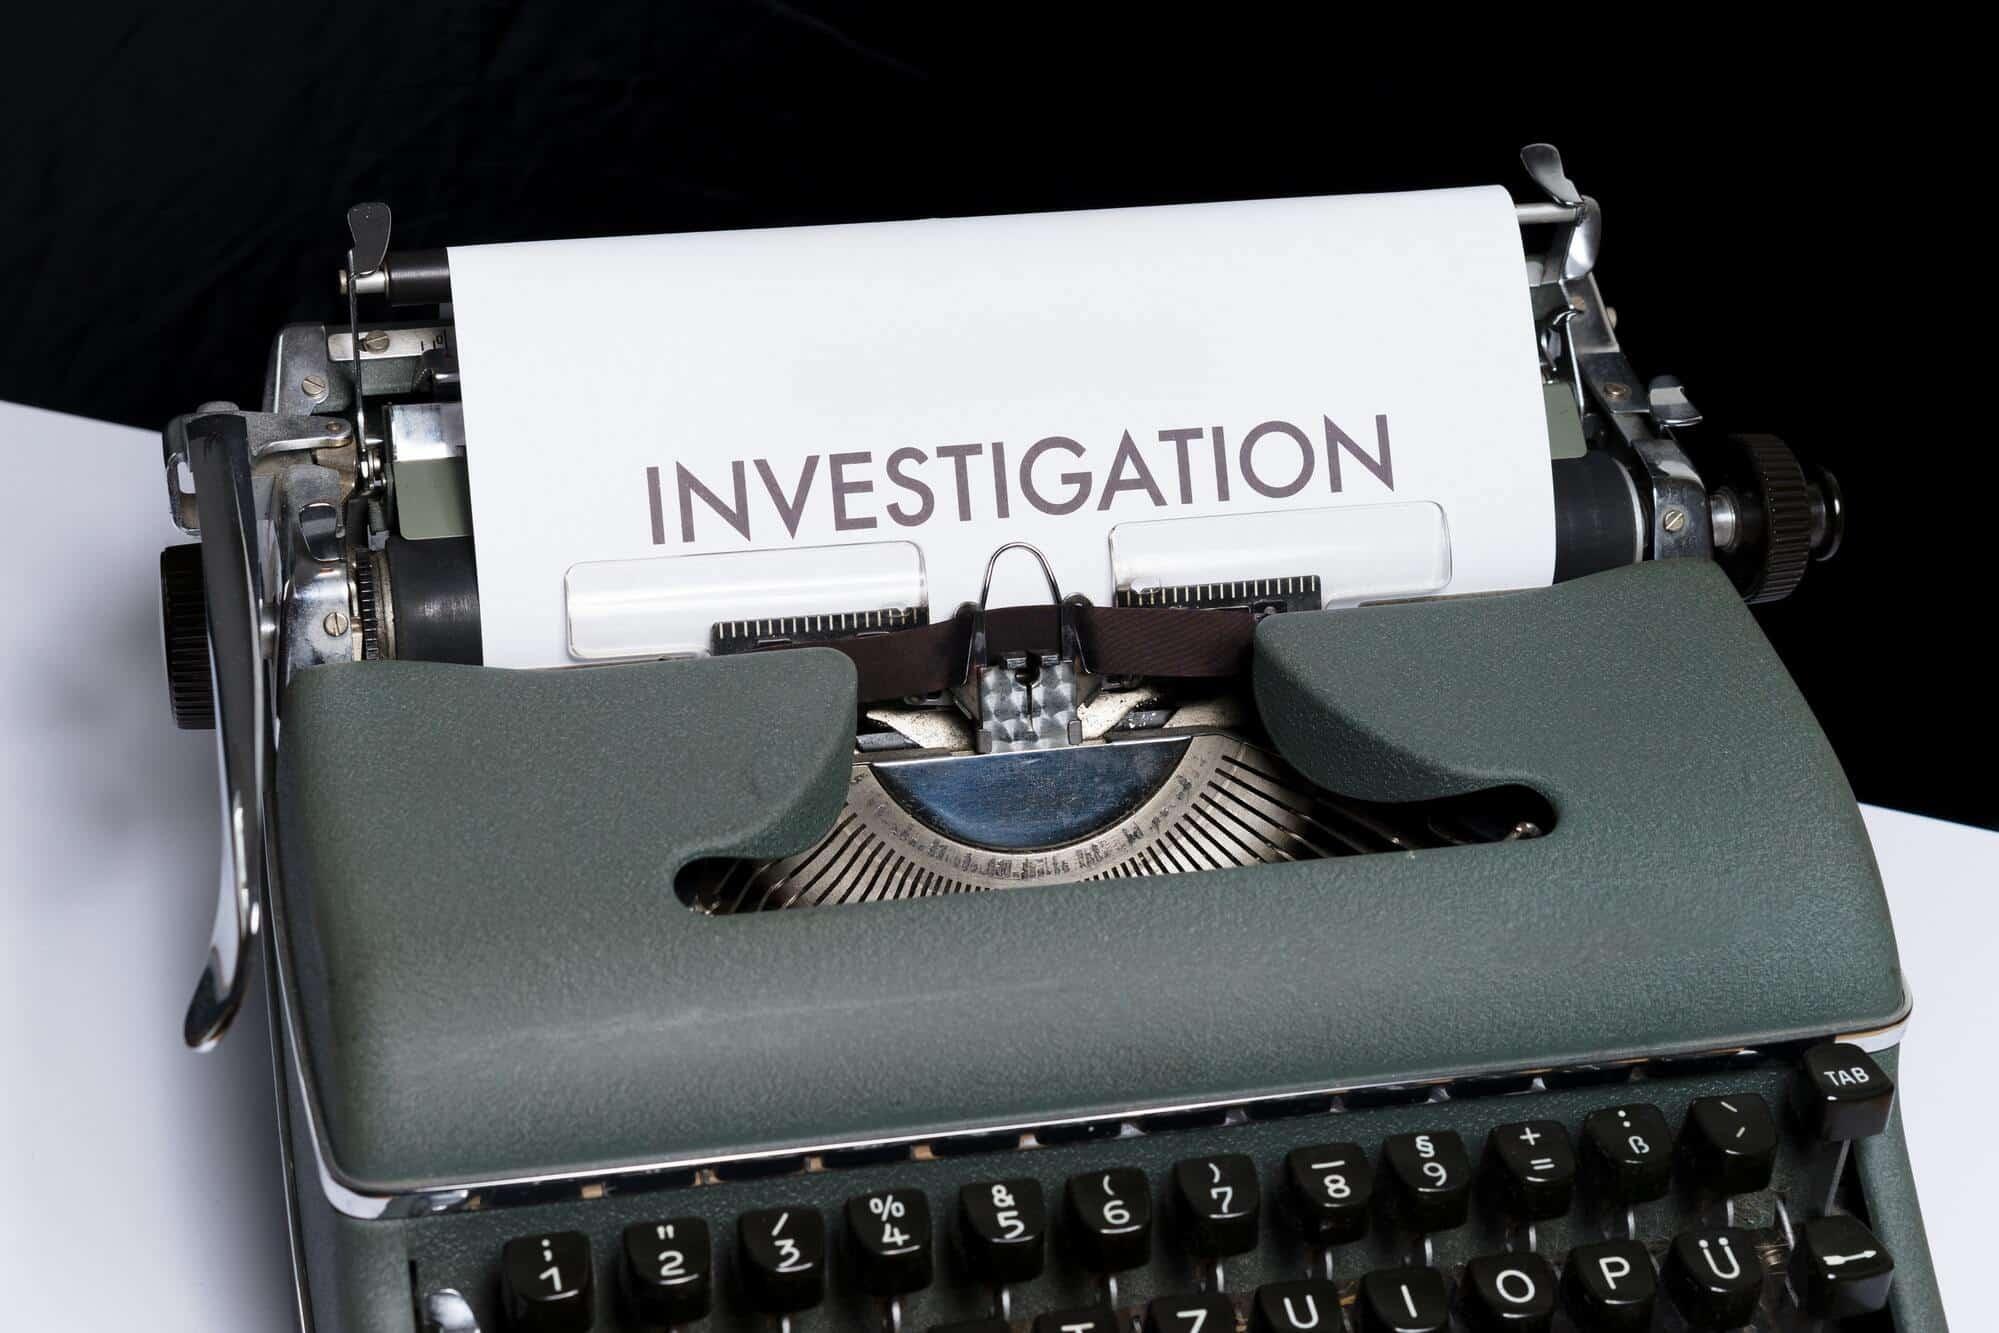 SEO website marketing blue dolphin typewriter investigation